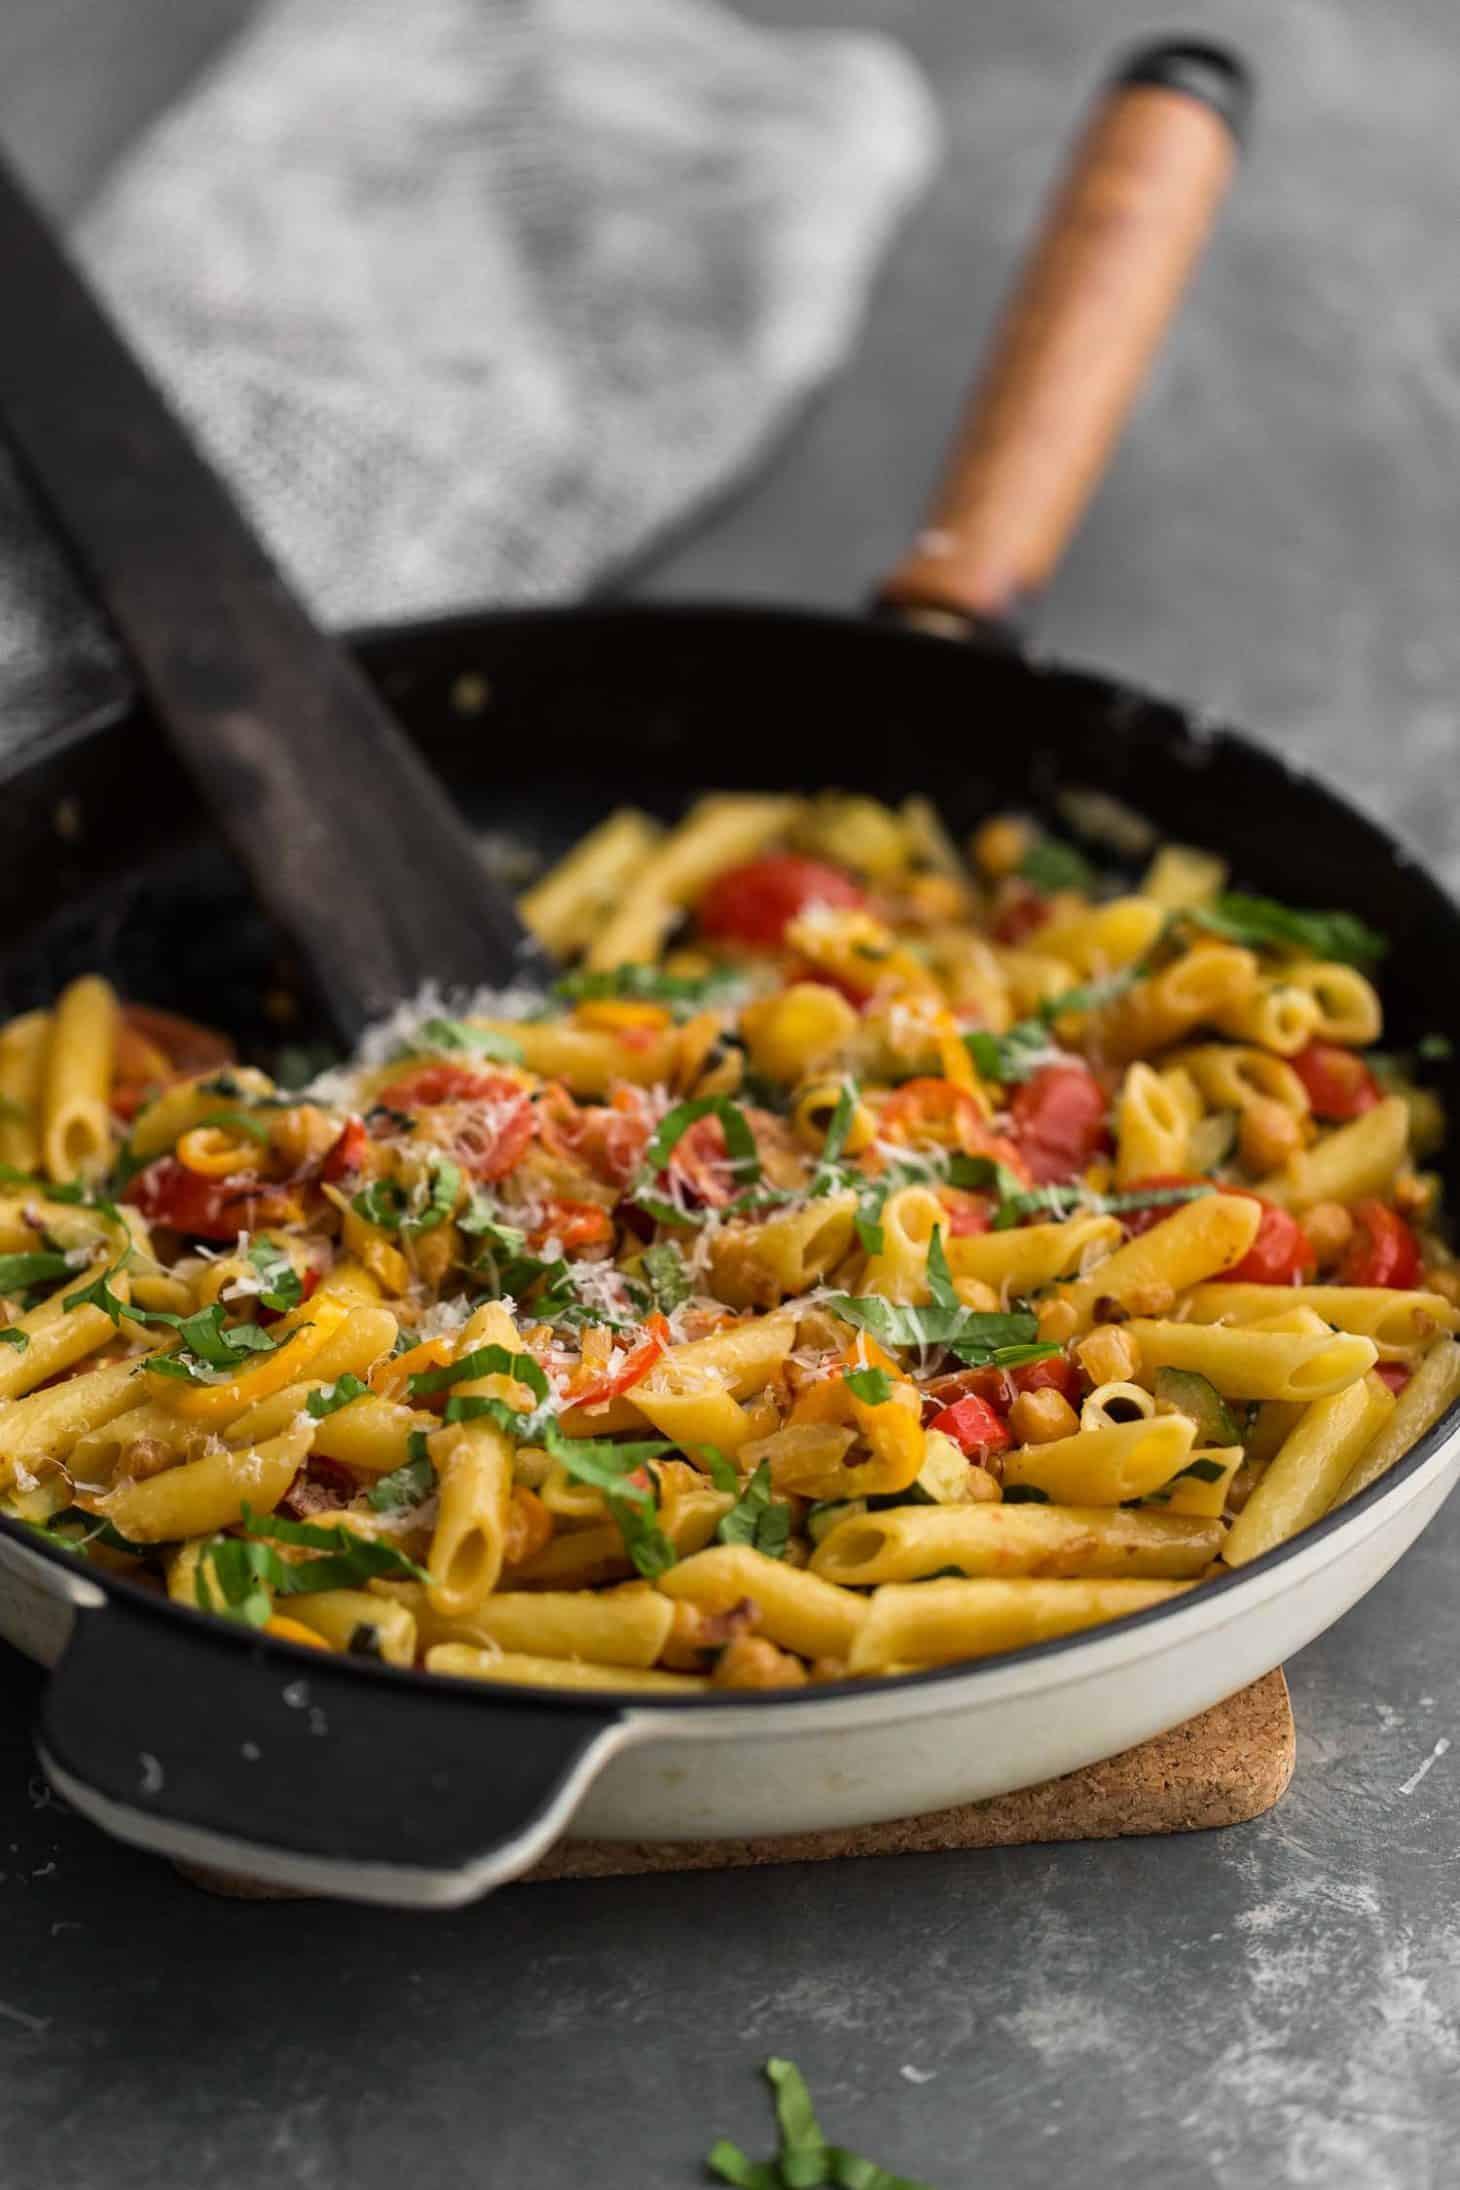 Vegetarian Summer Recipes  Patrick Ireland Reviews Fact based news on the Net